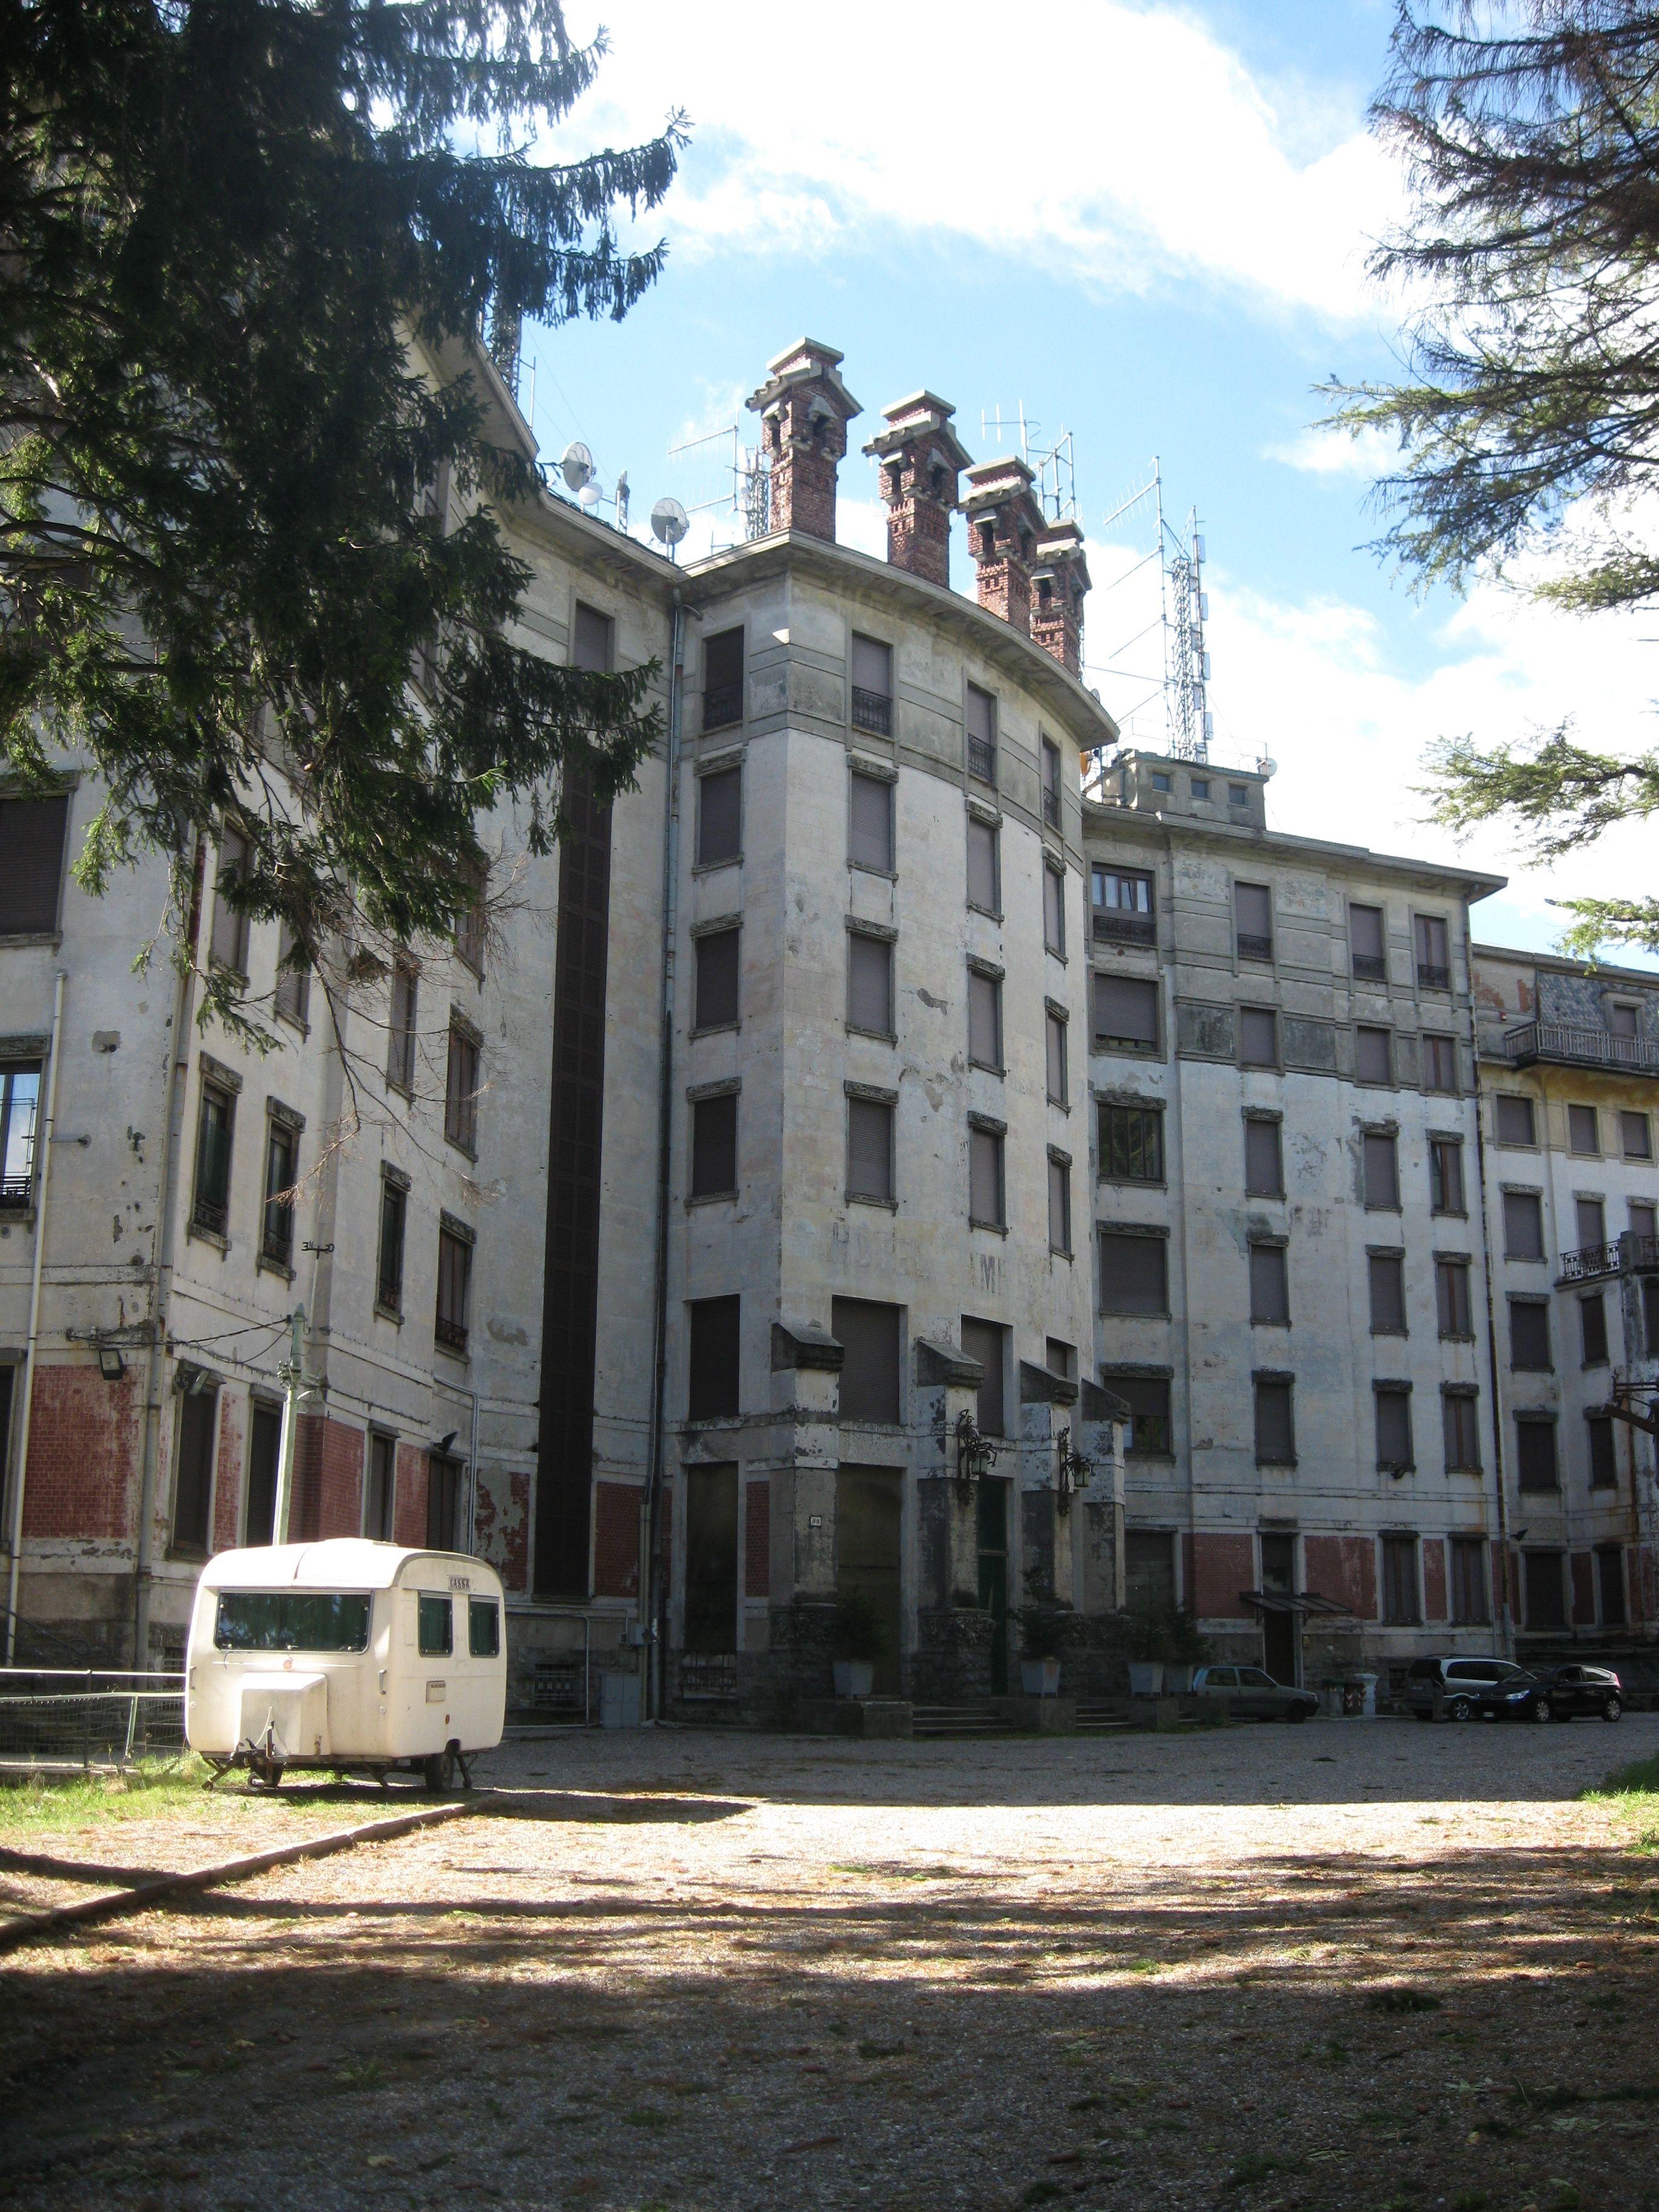 Grand Hotel Campo Dei Fiori Varese Italy. Abandoned